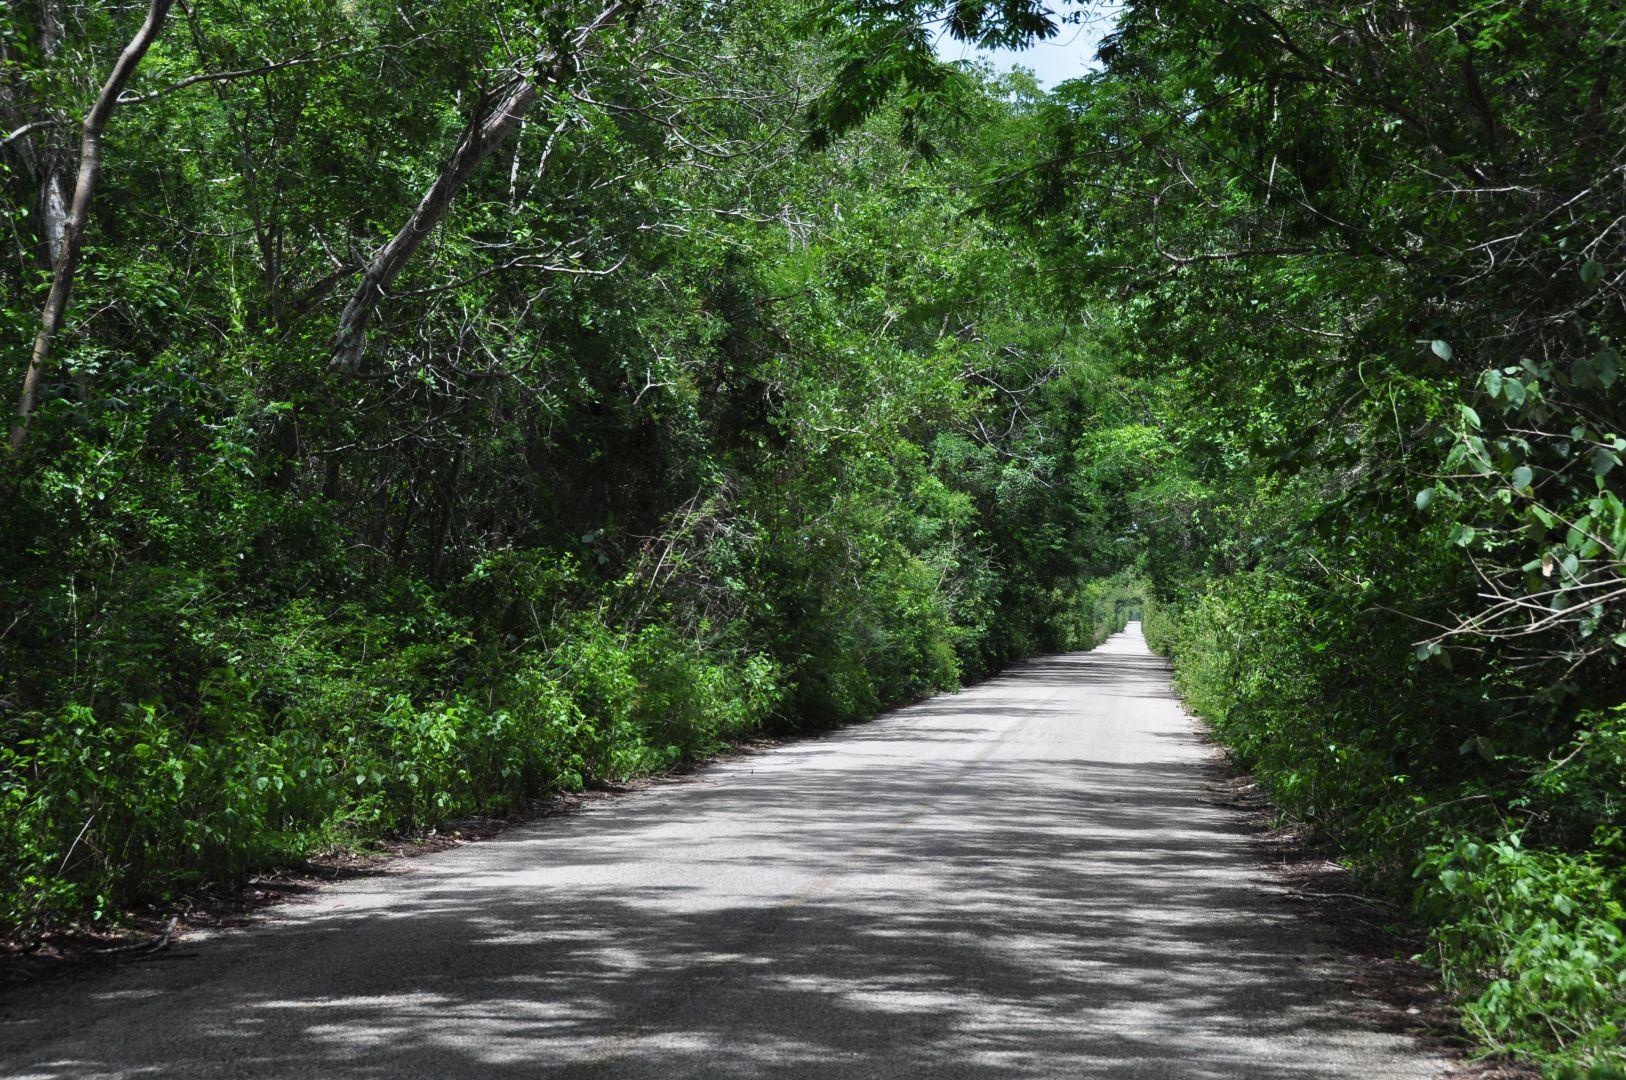 camino angosto